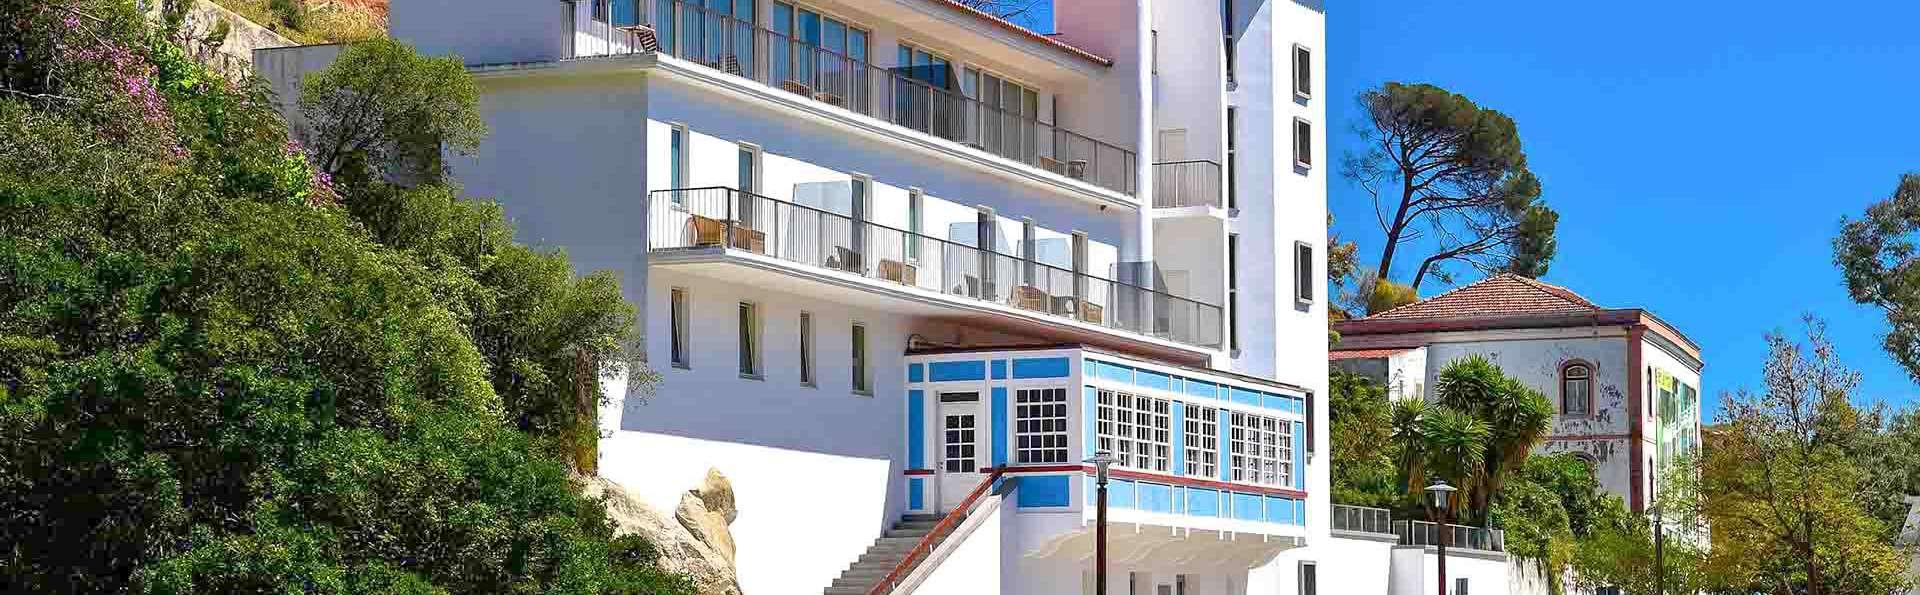 Hotel D. Carlos Regis - Monchique - EDIT_EXTERIOR_01.jpg